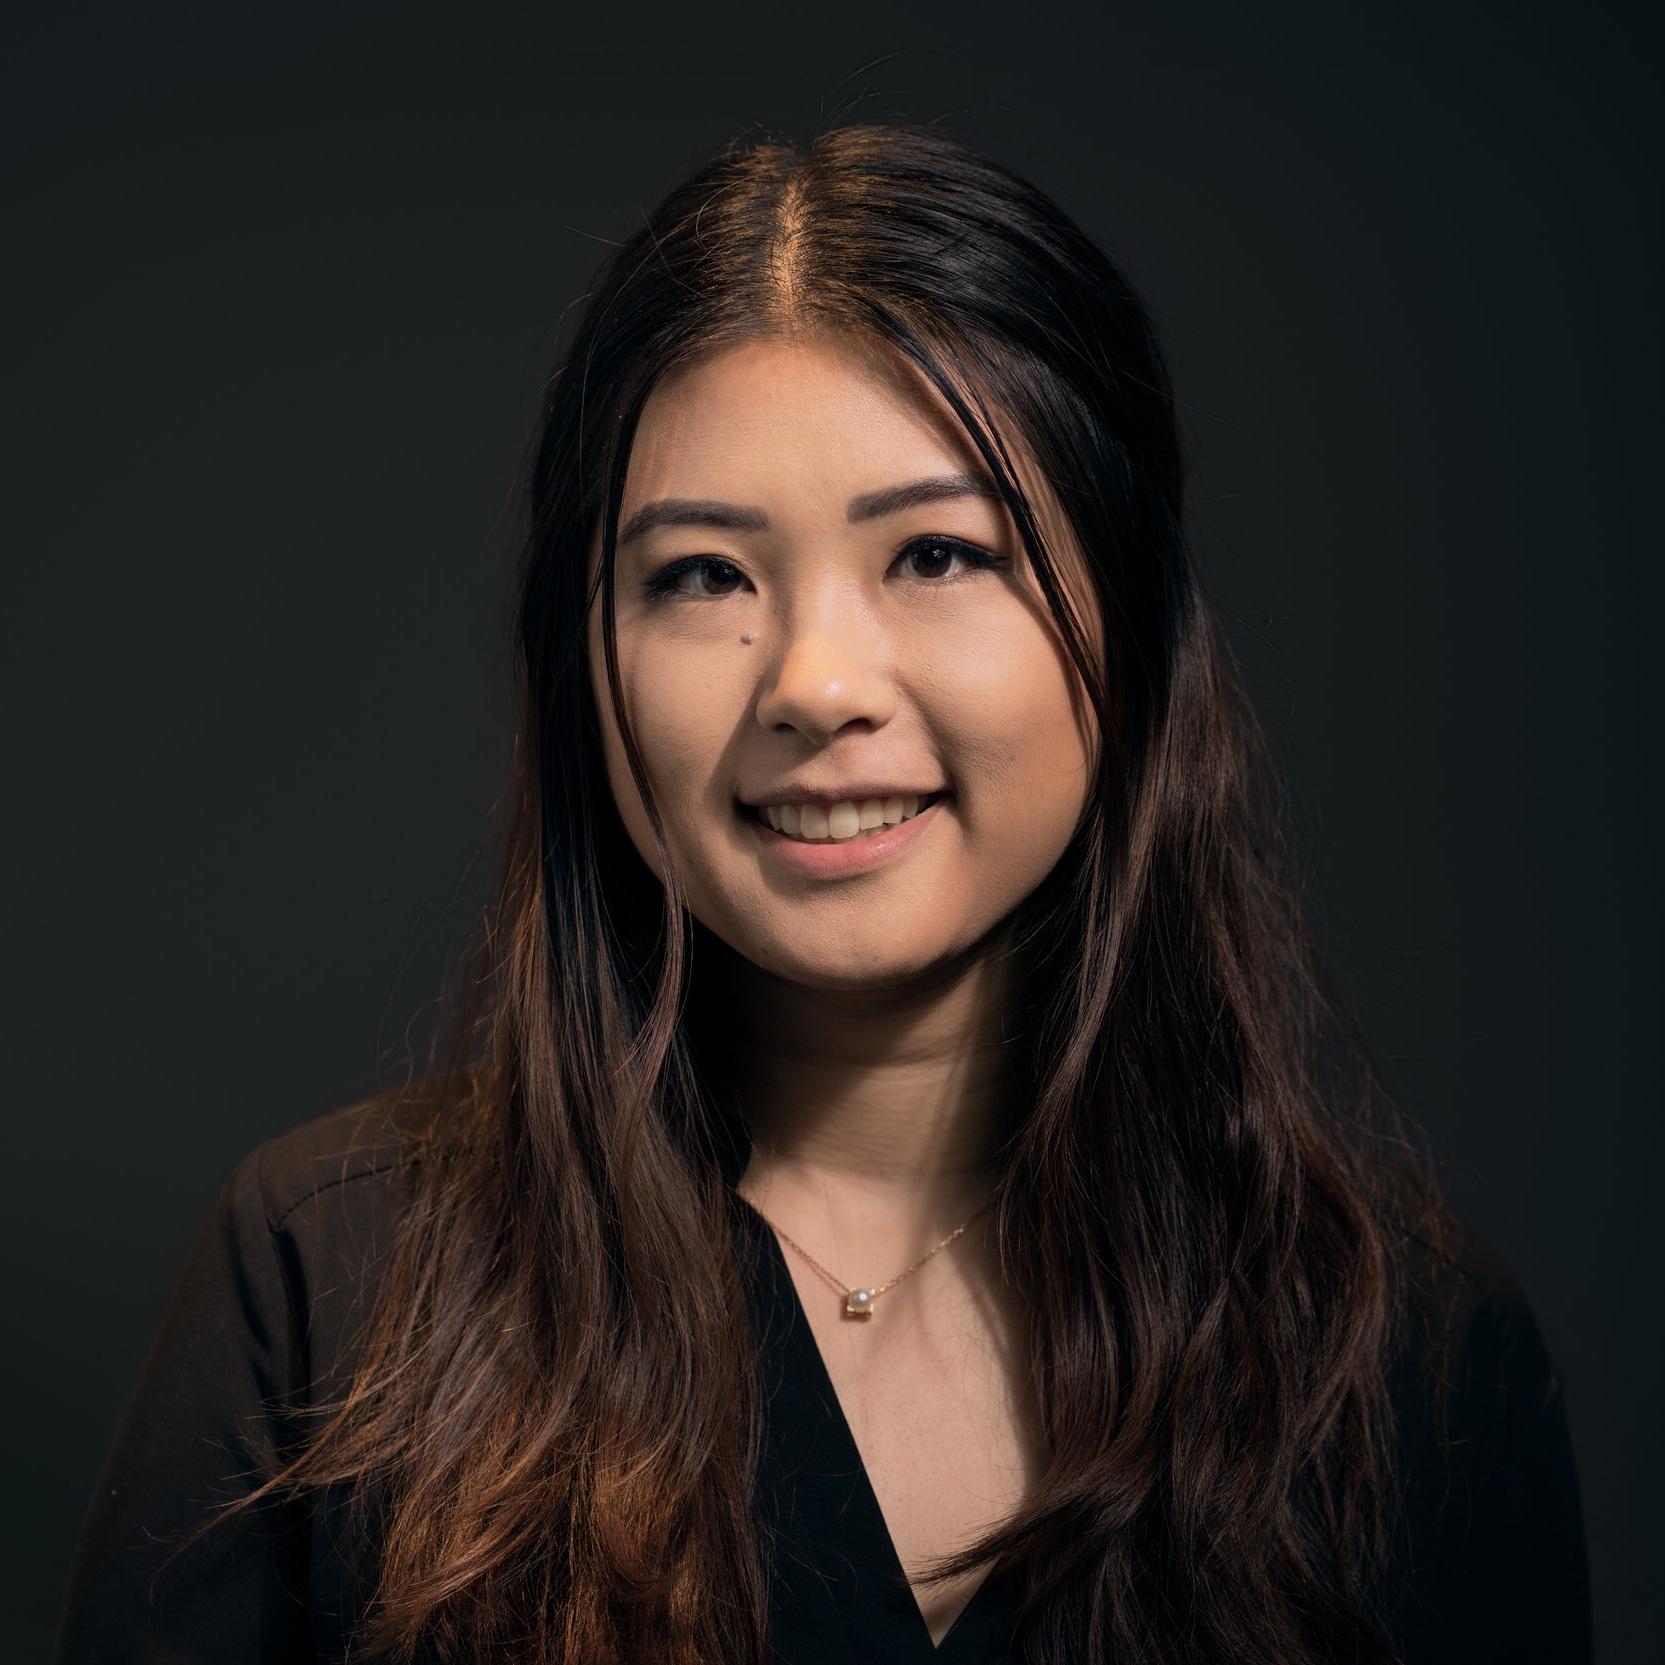 Terri Tan - Director of Fundraising